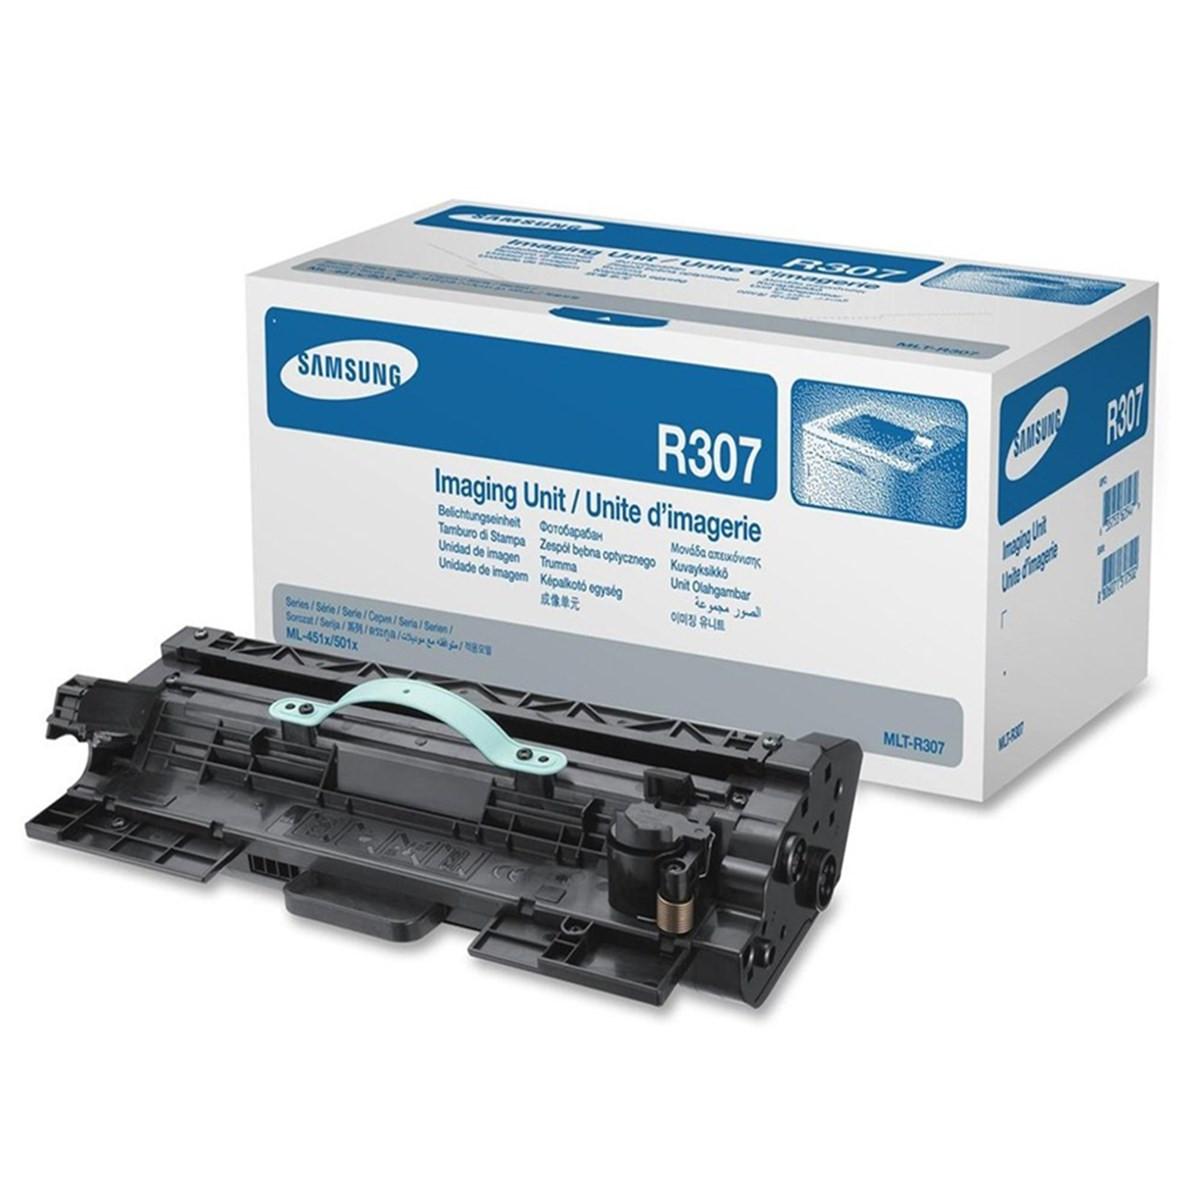 Cartucho de Cilindro Samsung MLT-R307 MLTR307 | ML-4510ND ML-5010ND ML-5015ND | Original 60k